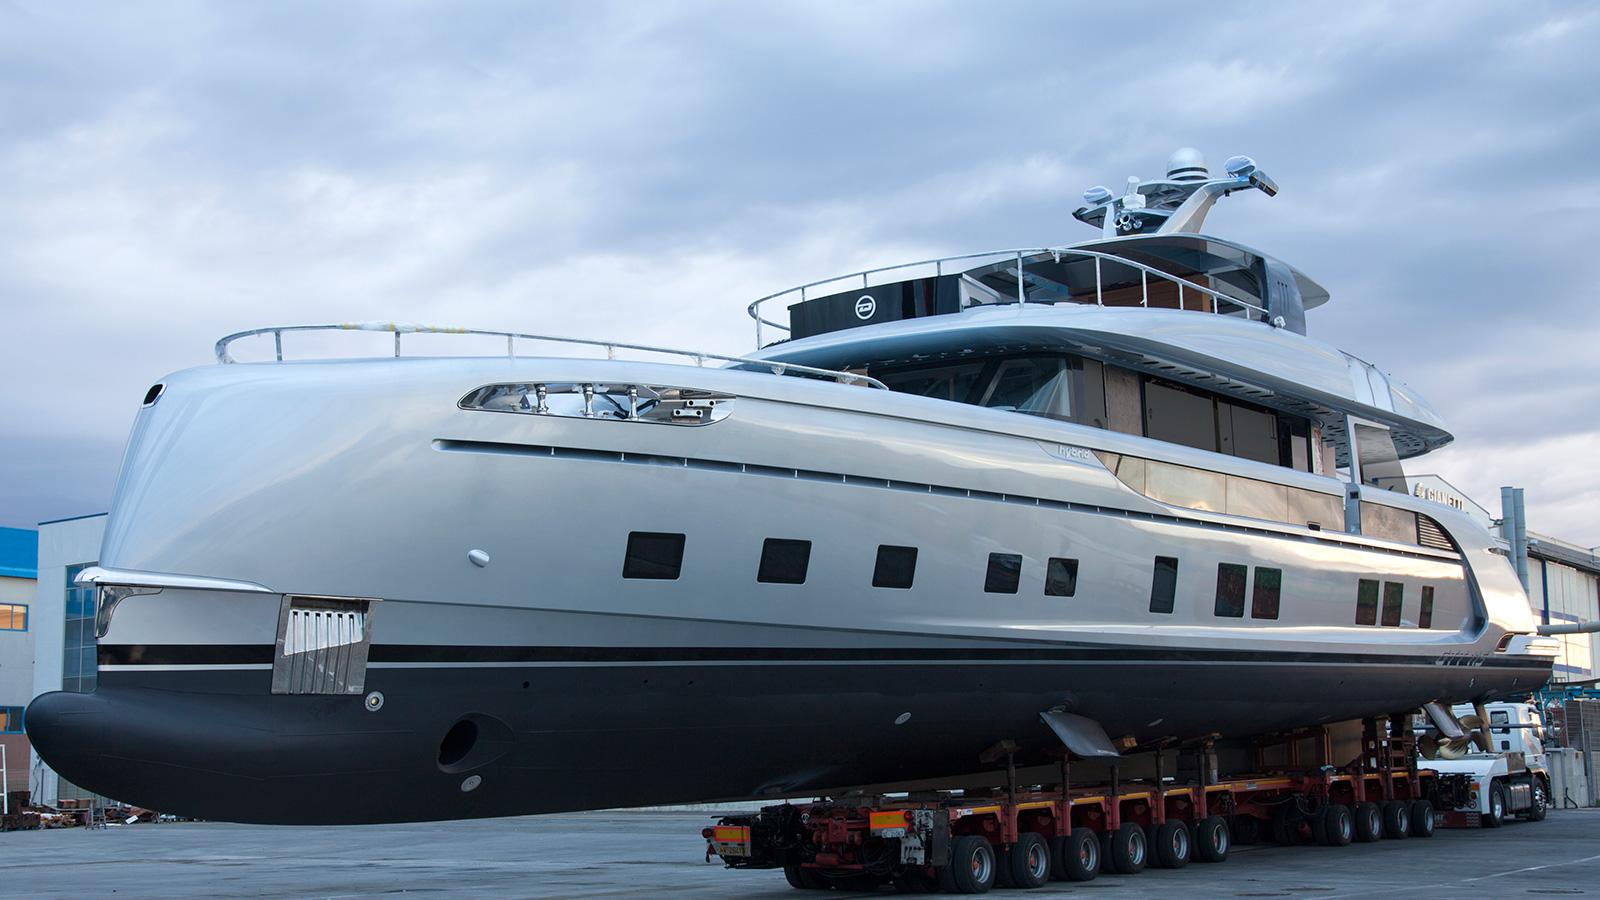 side-view-of-the-dynamiq-superyacht-gtt-115